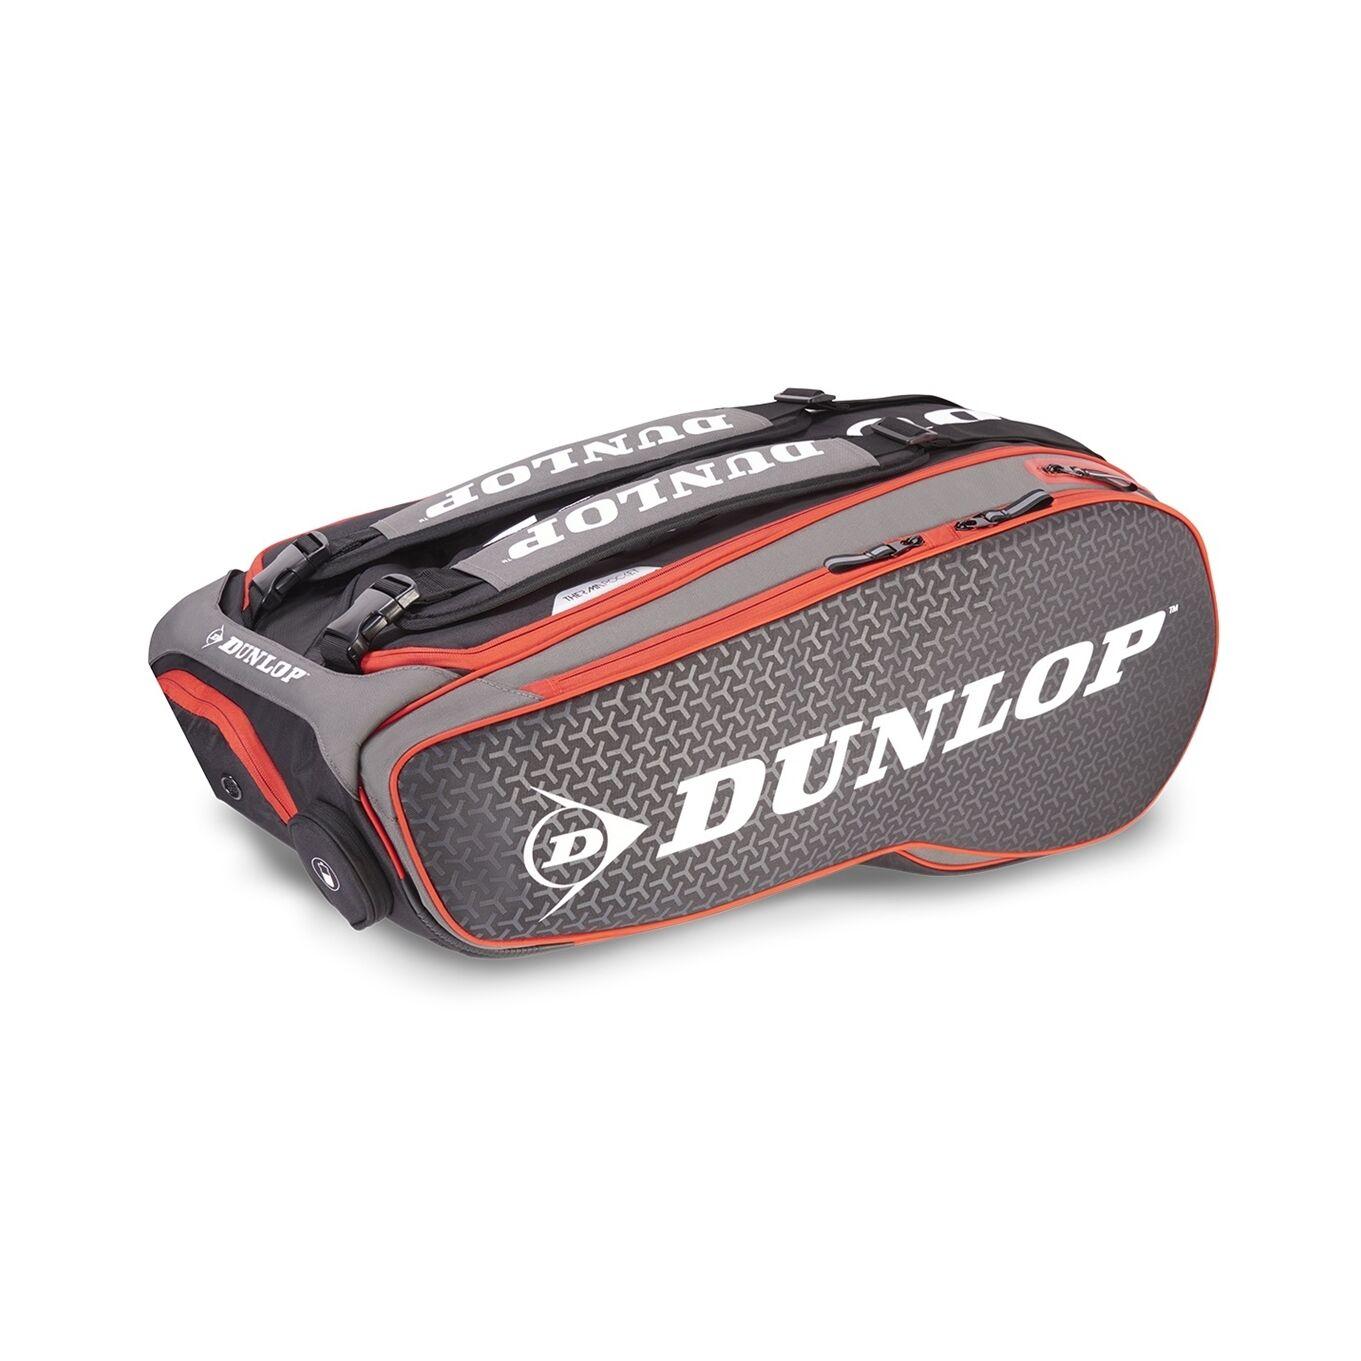 Dunlop Performance 12 Racket Bag Black